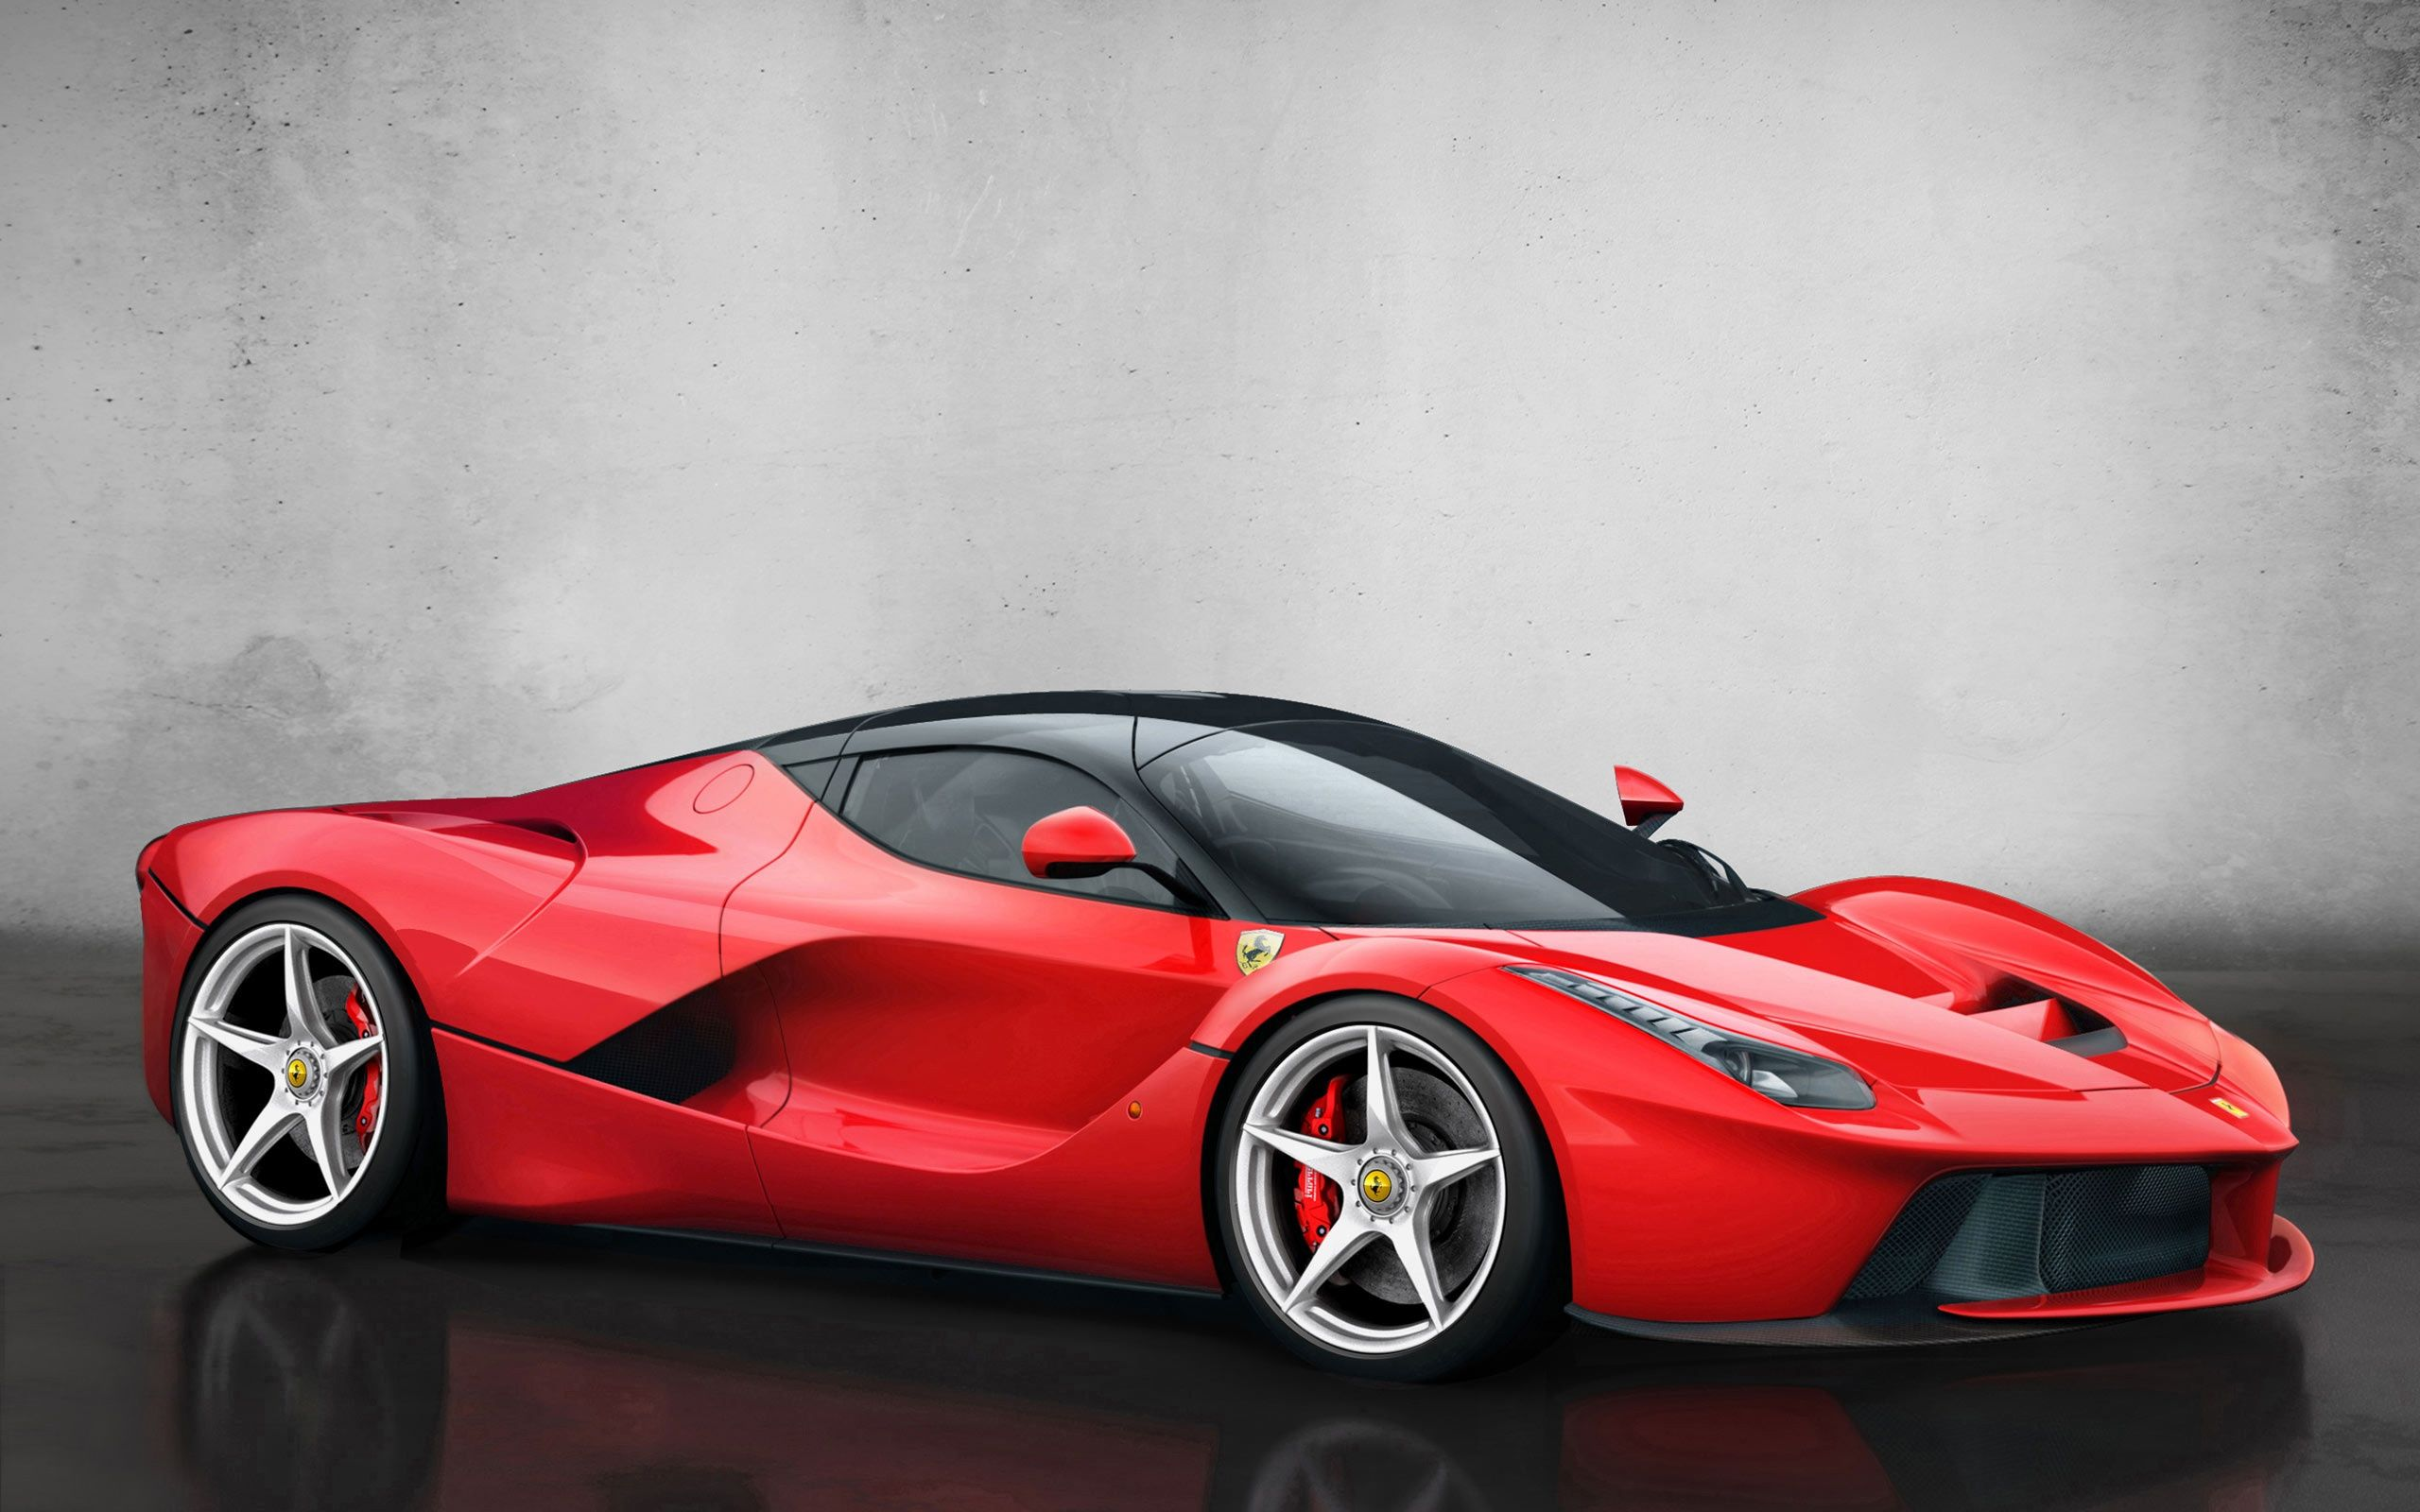 Ferrari laferrari xx track car speculation diseno art cars ferrari laferrari xx track car speculation diseno art cars pinterest ferrari laferrari ferrari and supercars vanachro Gallery